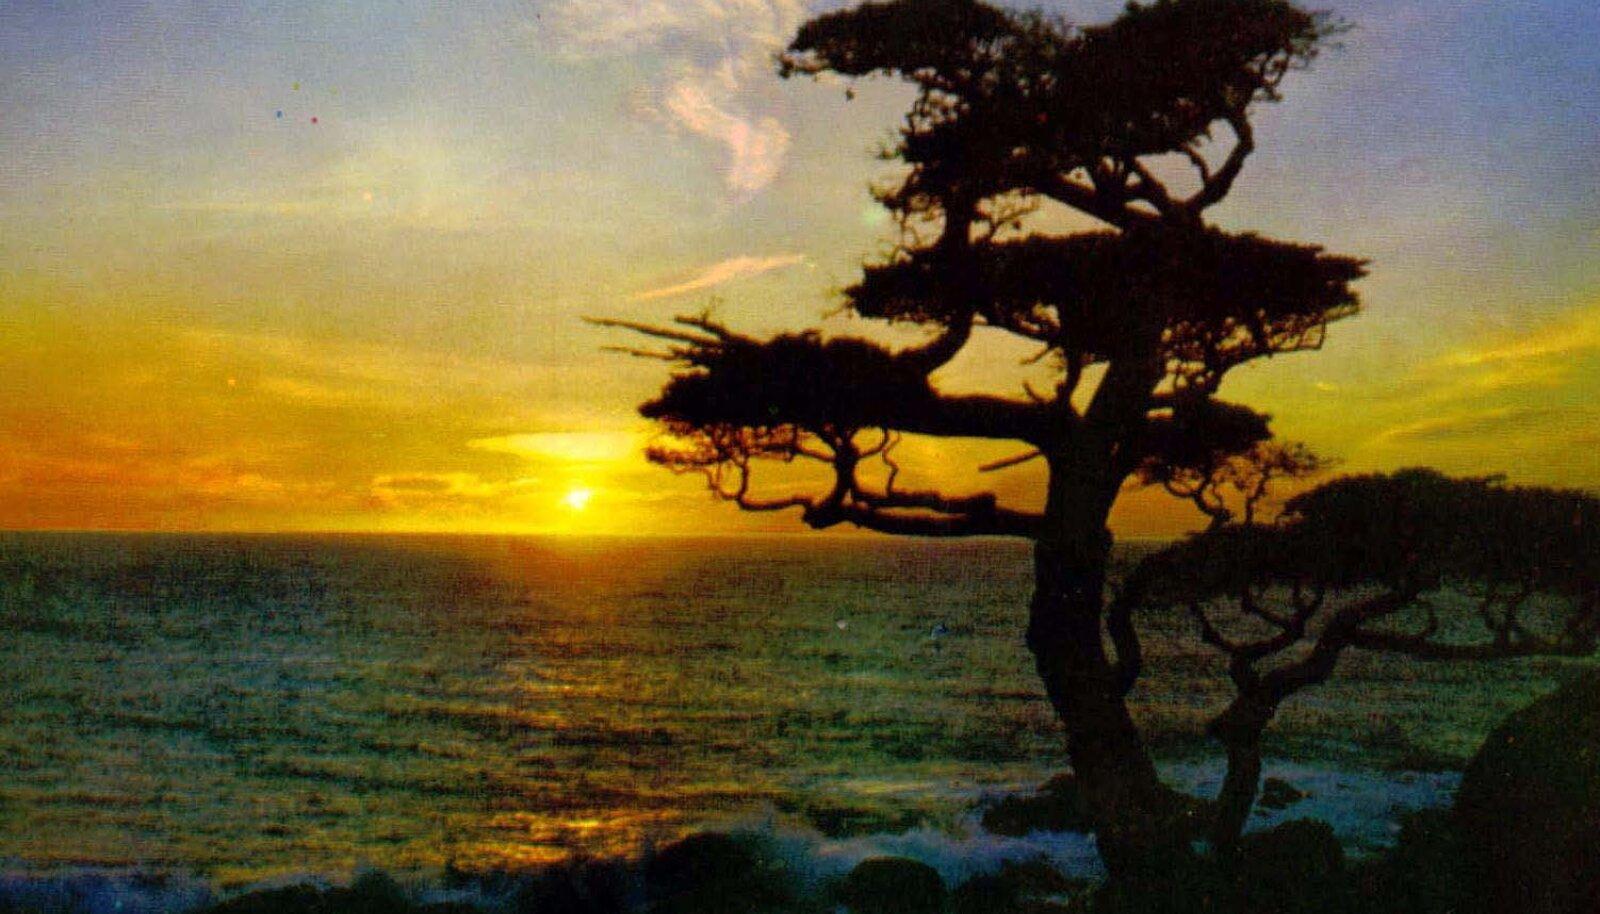 Päikeseloojang Antillidel (Foto: Wikimedia Commons / Terry Whalebone)